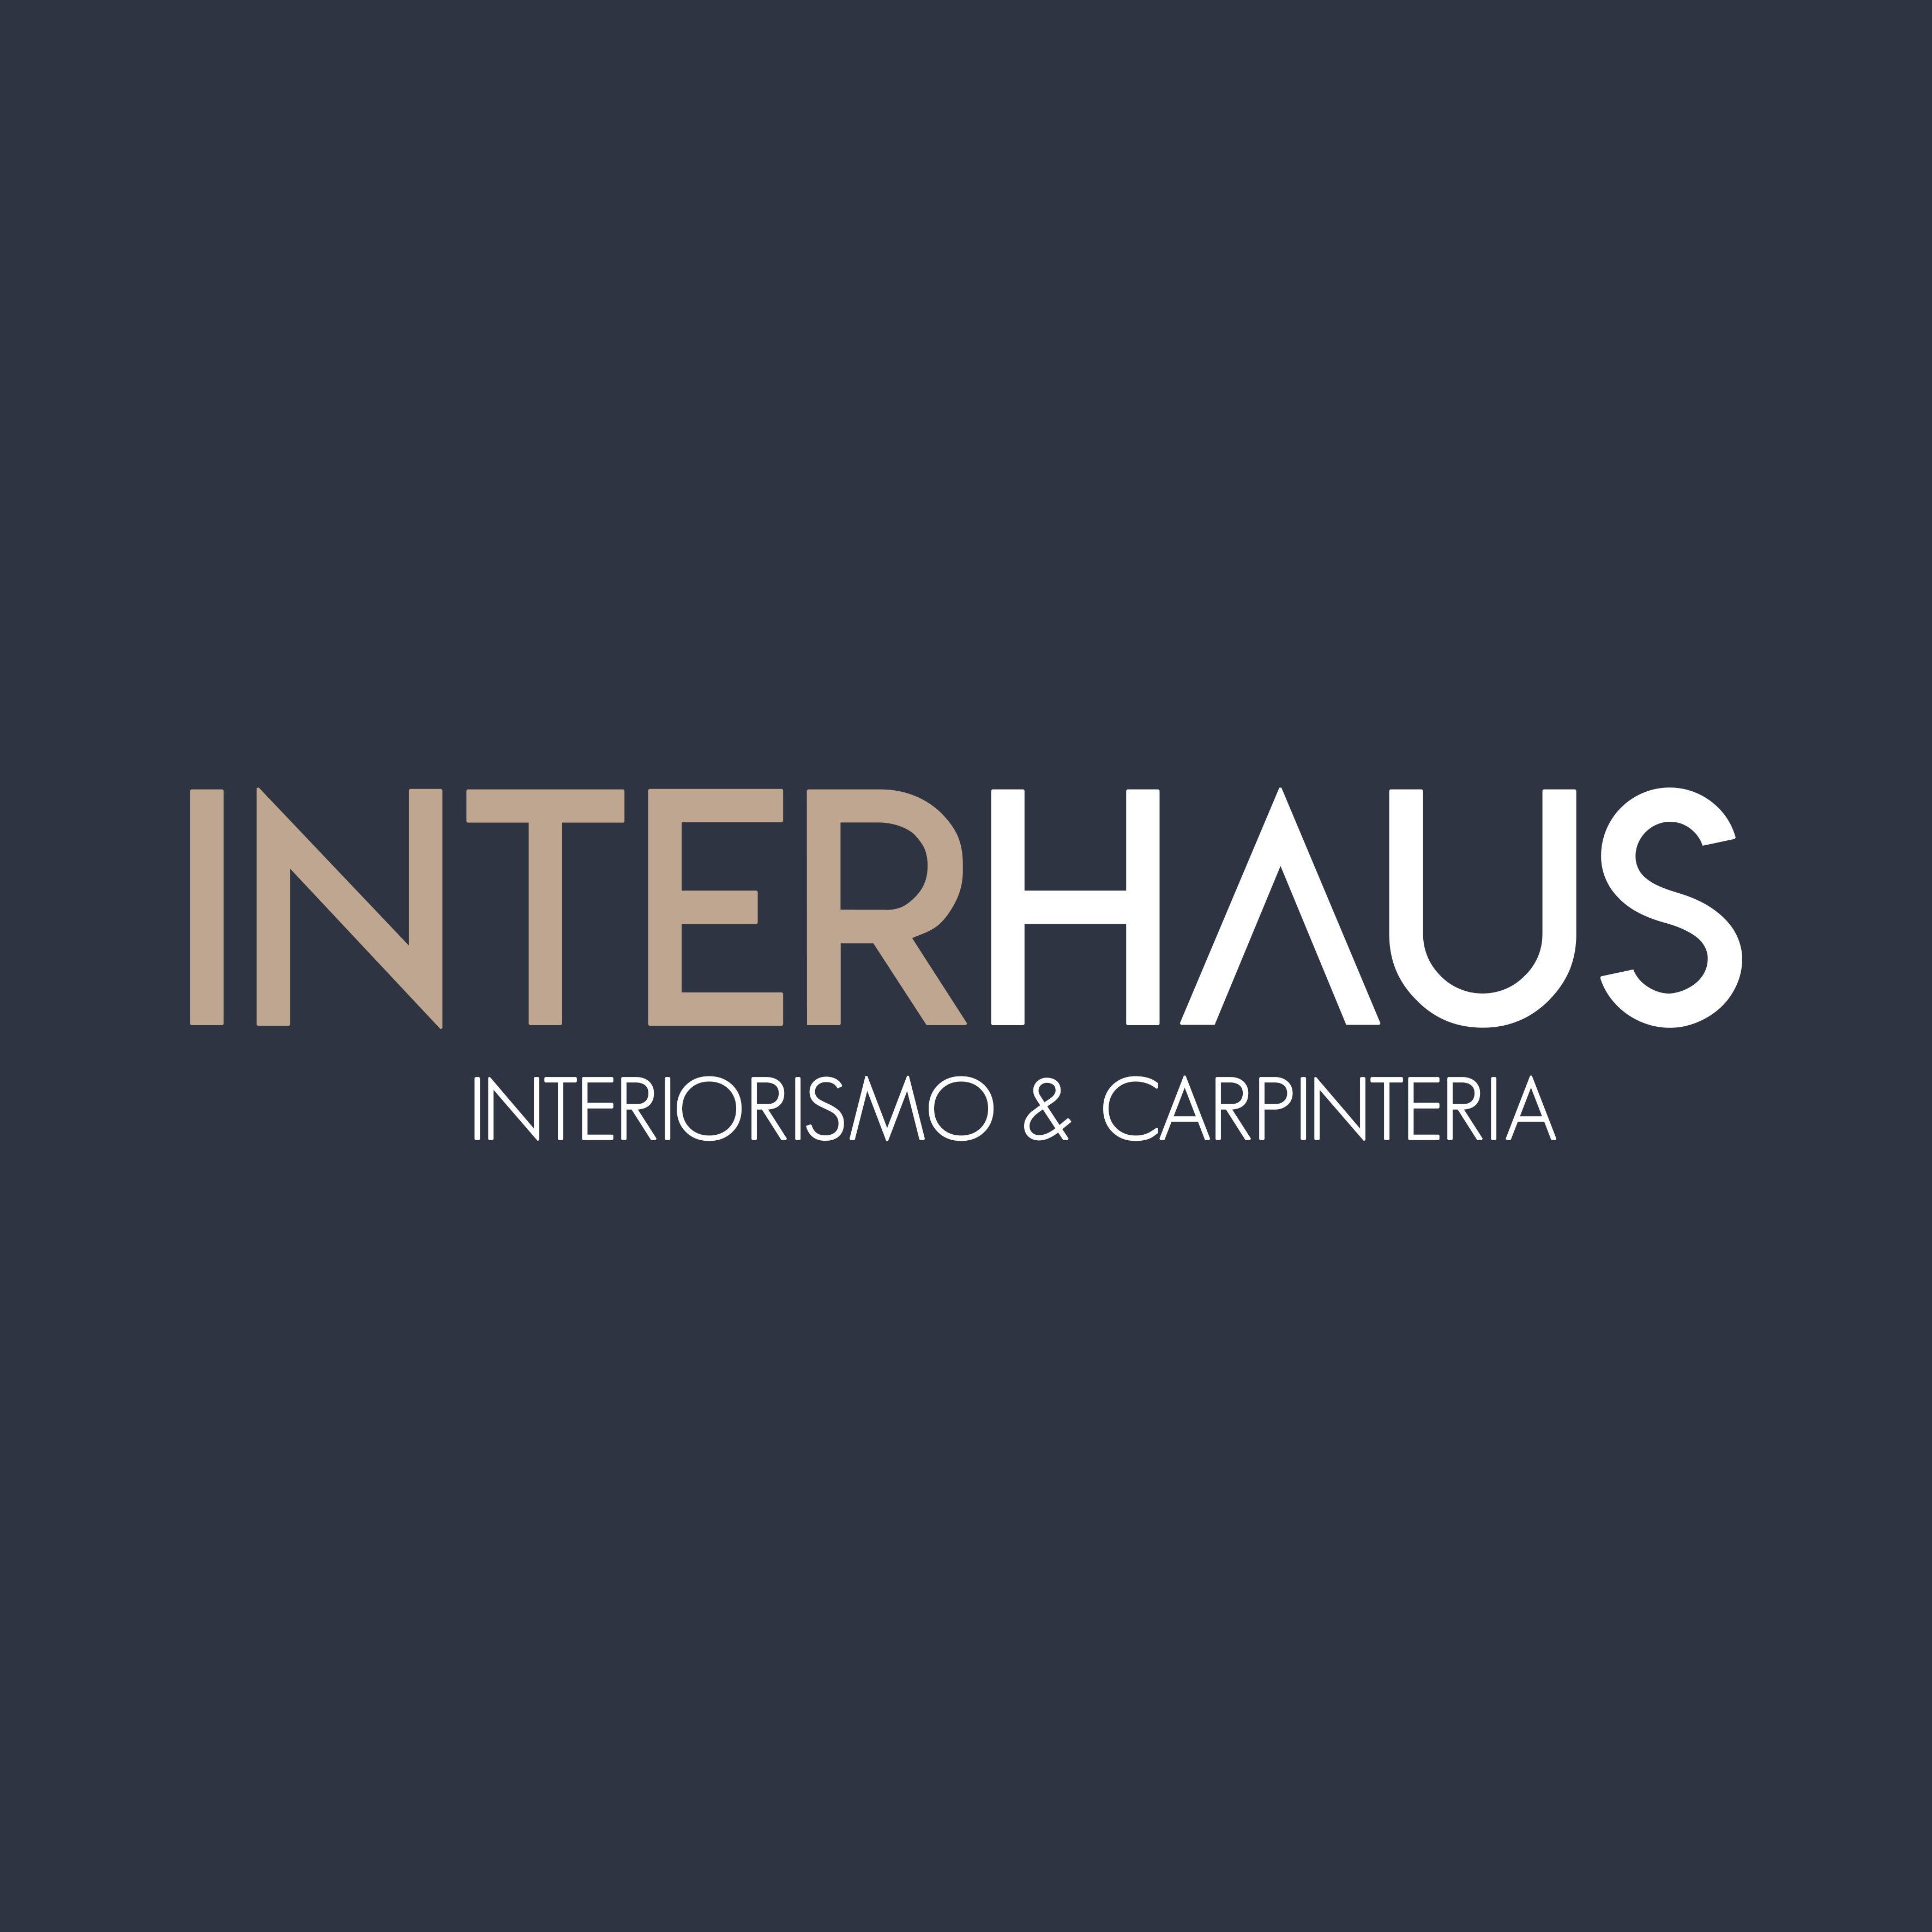 INTERHAUS